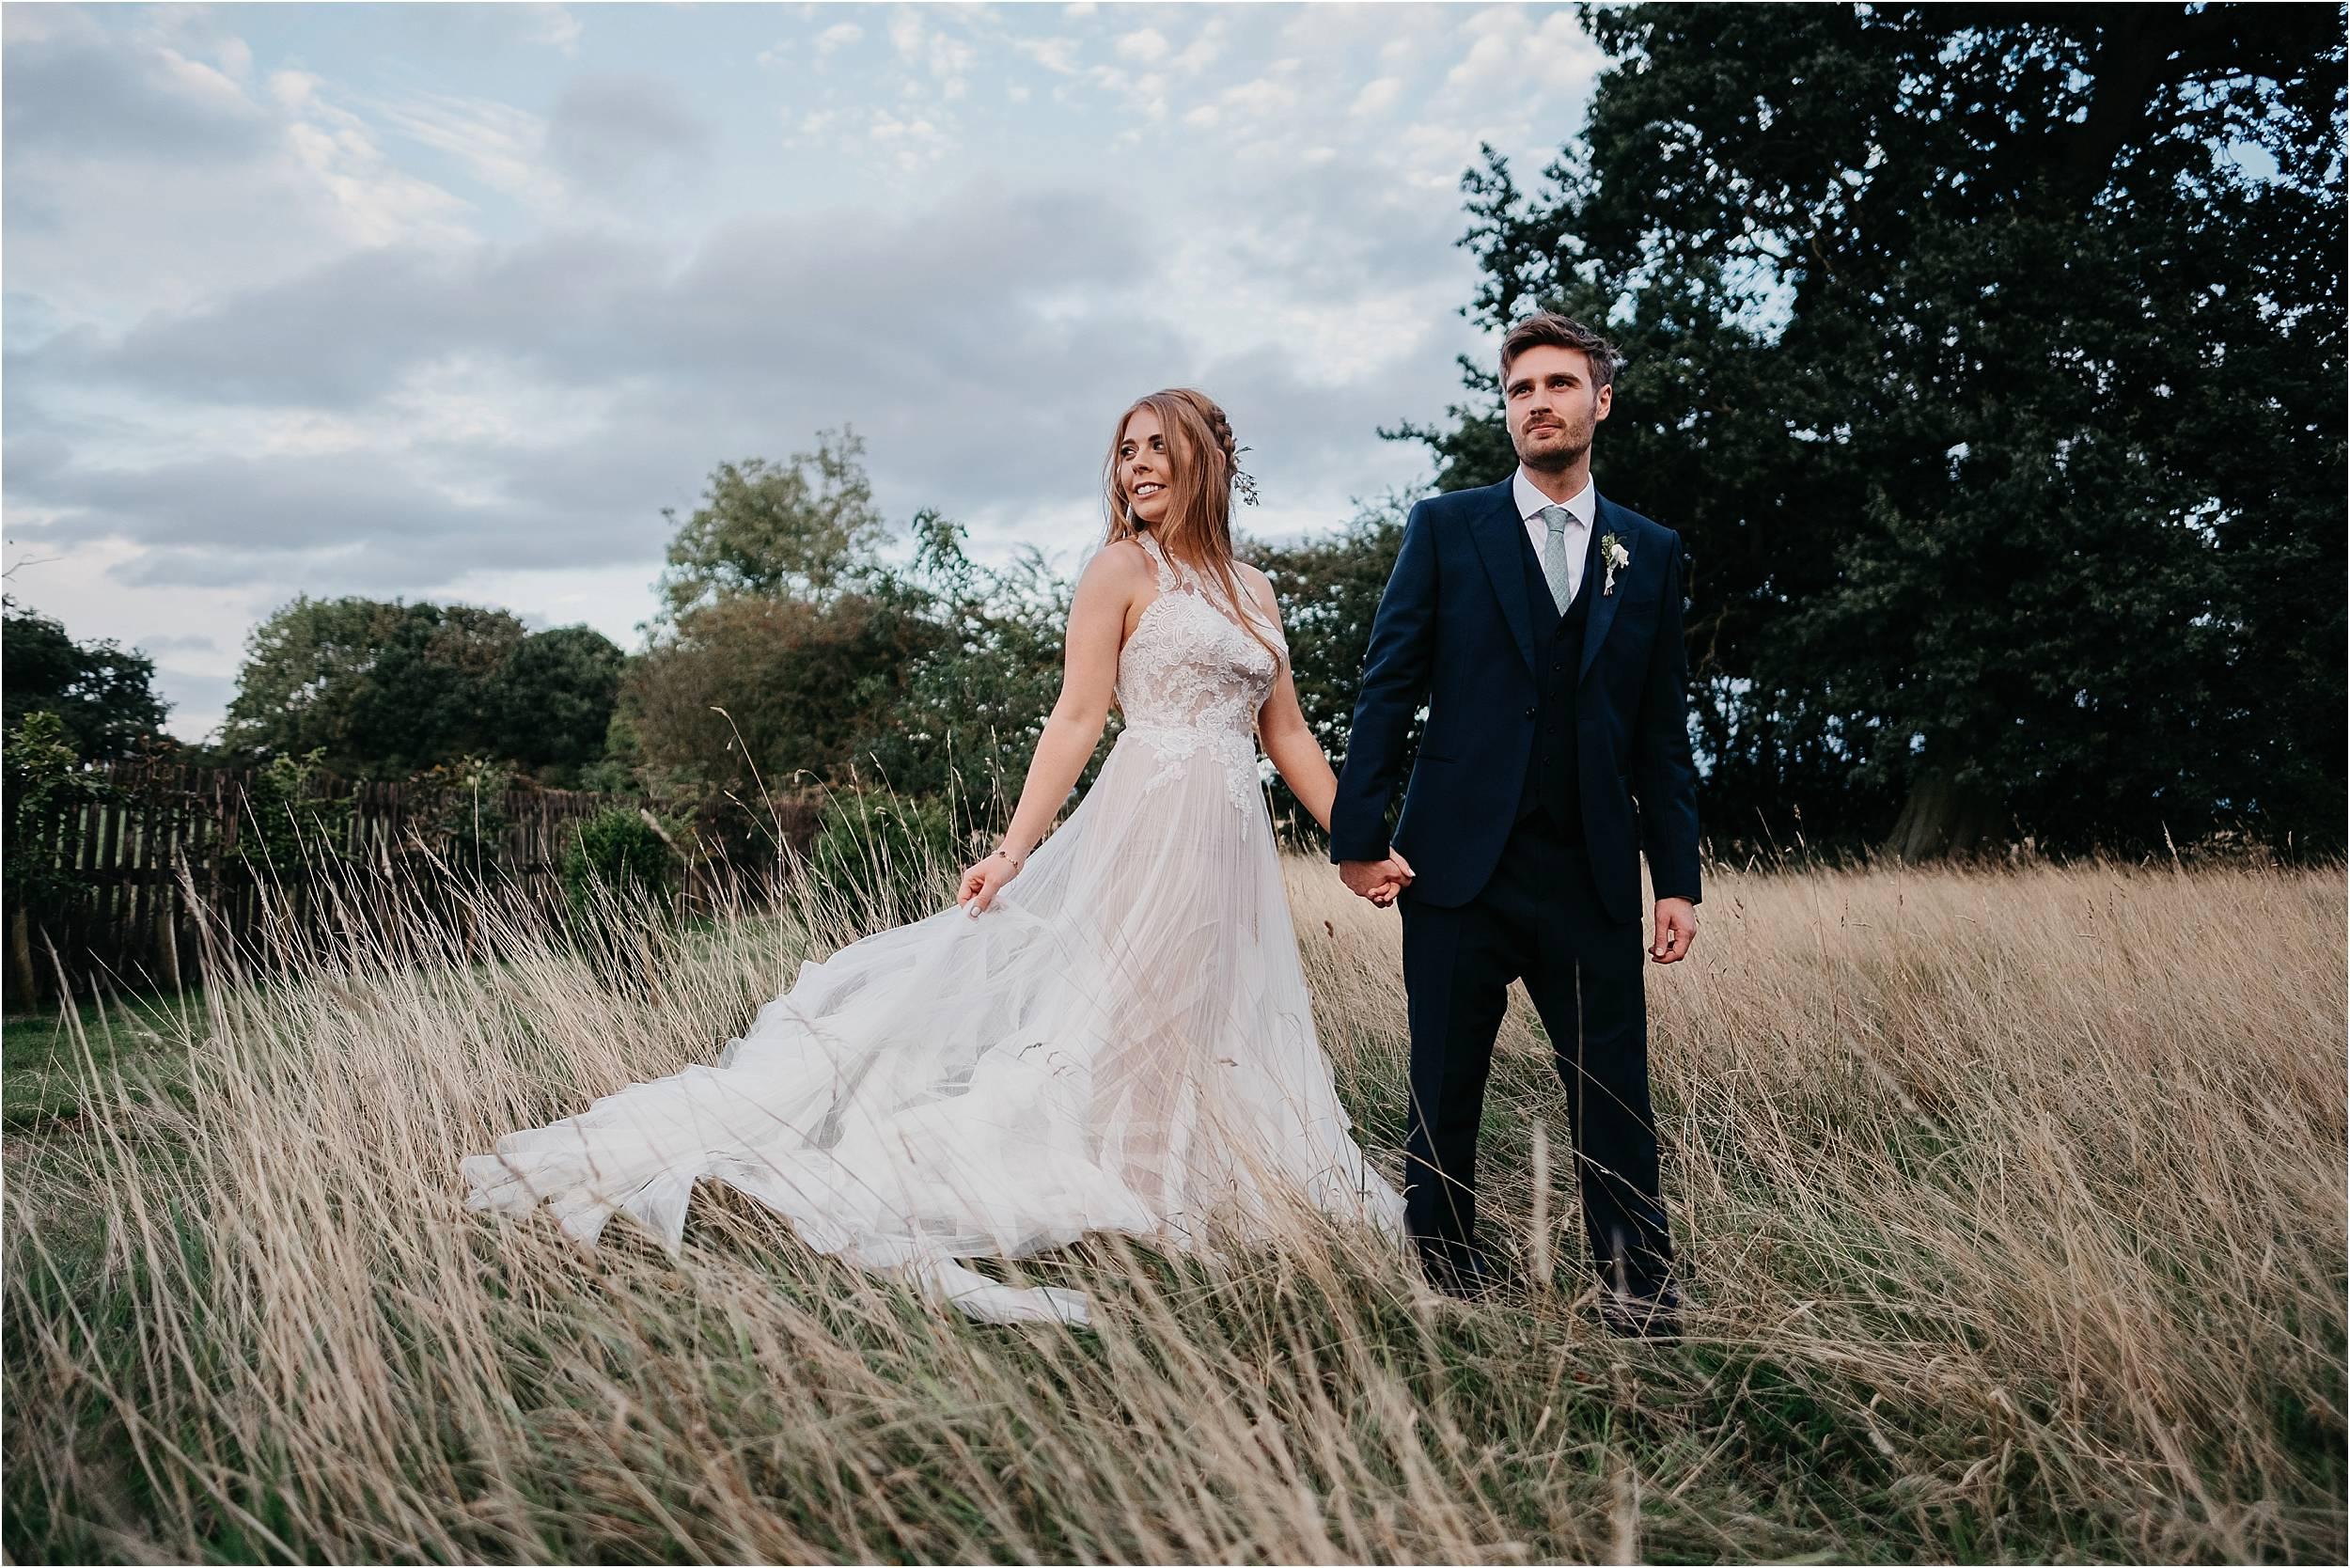 The Priory Little Wymondley Wedding Photography_0167.jpg